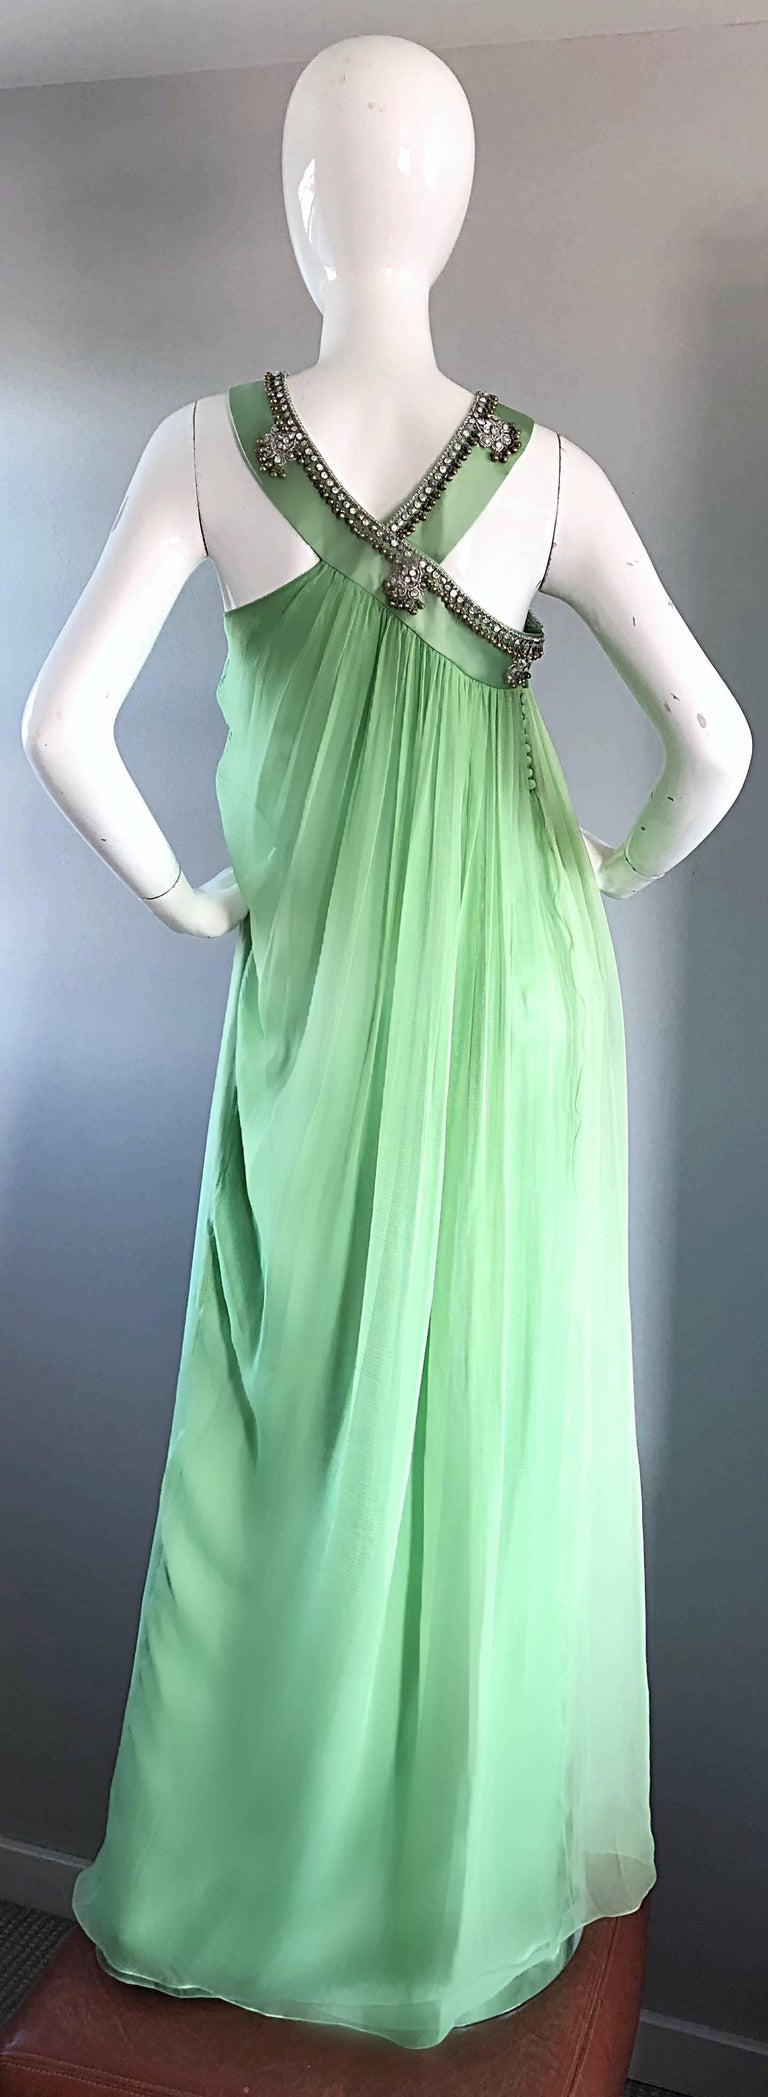 New Christian Dior John Galliano Light Green Silk Chiffon Grecian Gown, Sz 10   For Sale 4